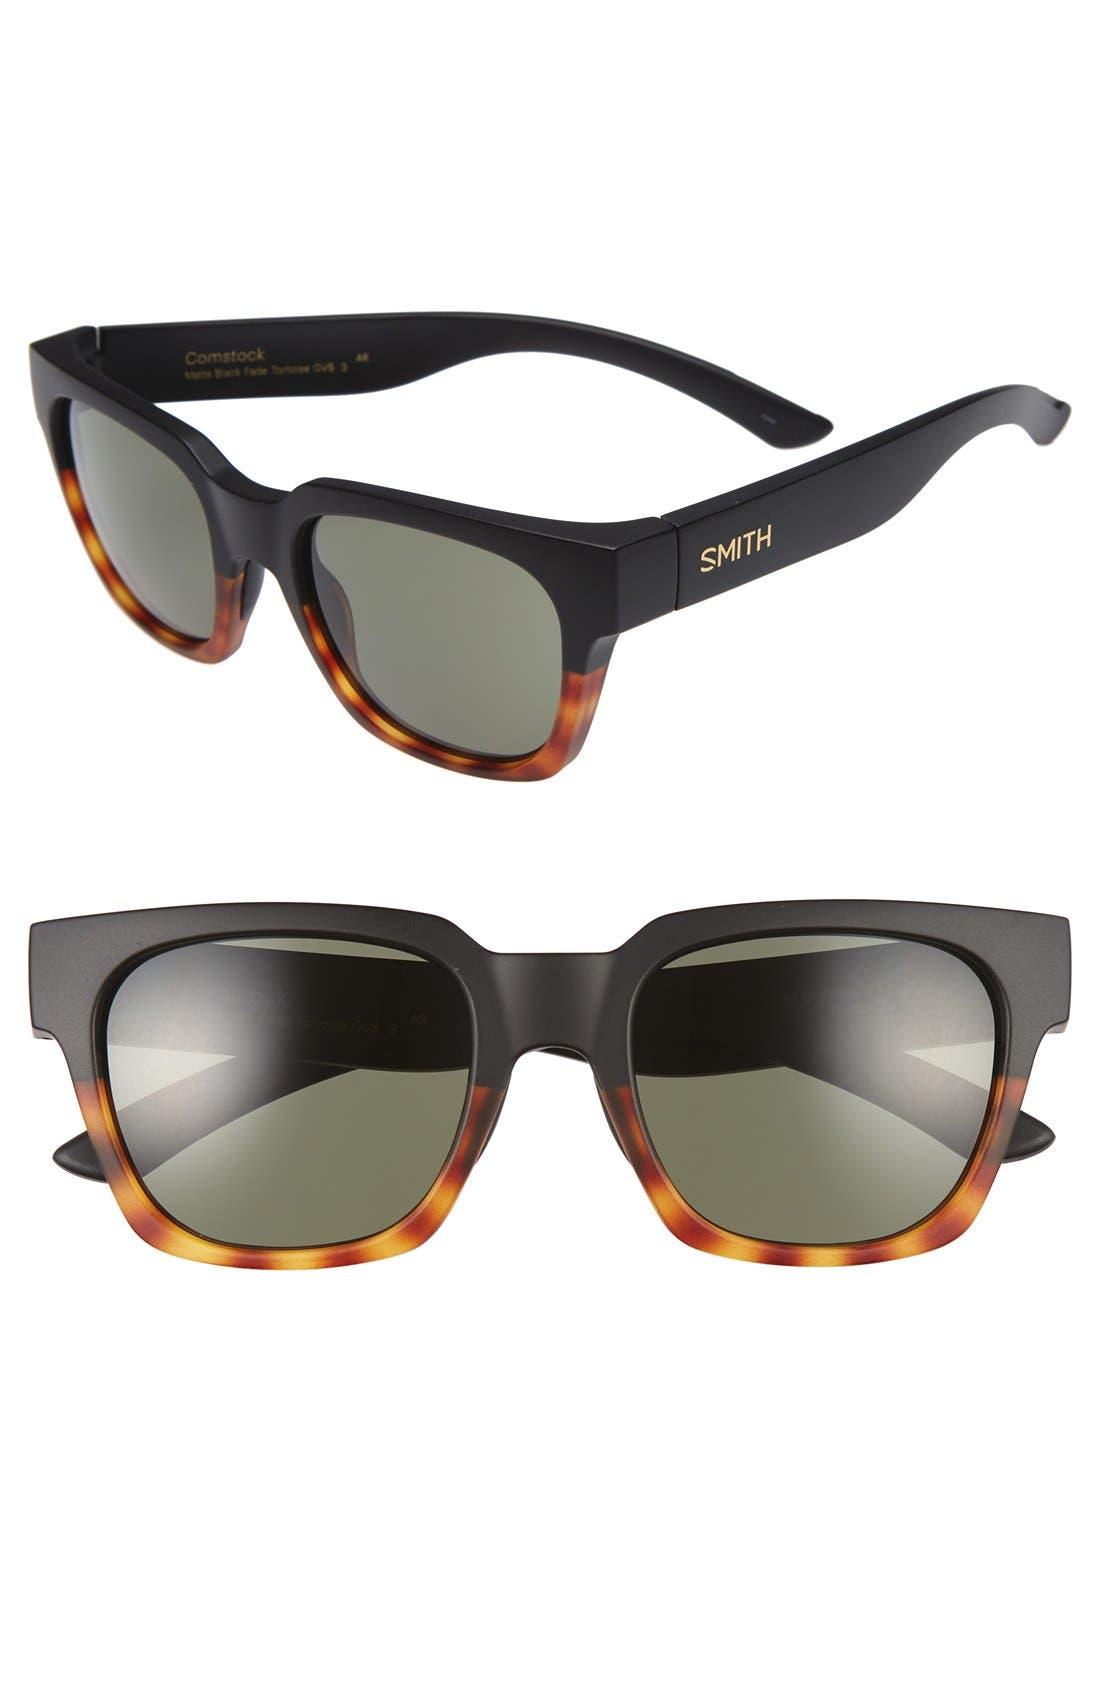 Smith 'Comstock' 51mm Polarized Sunglasses